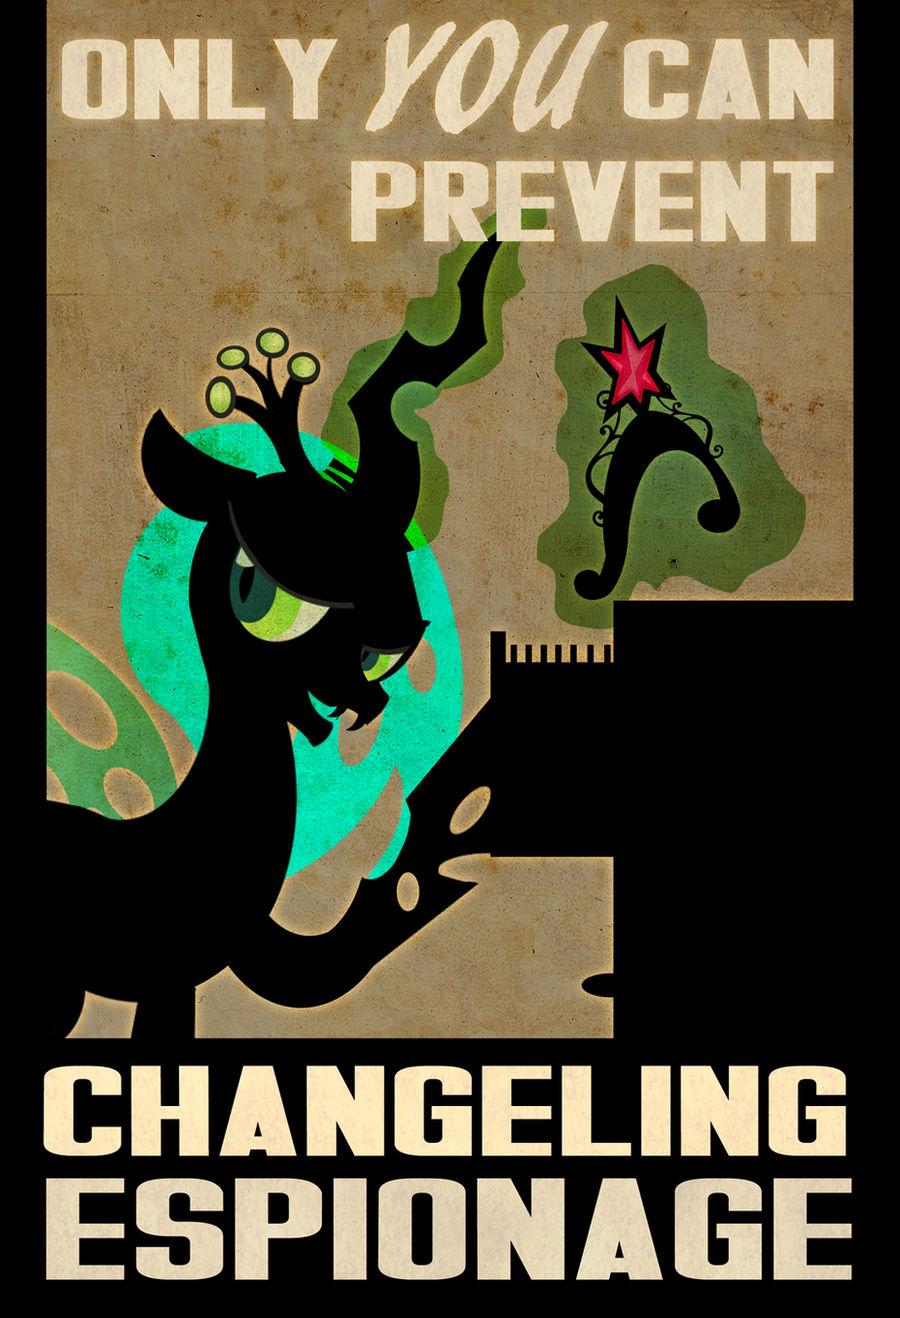 Changling Espionage